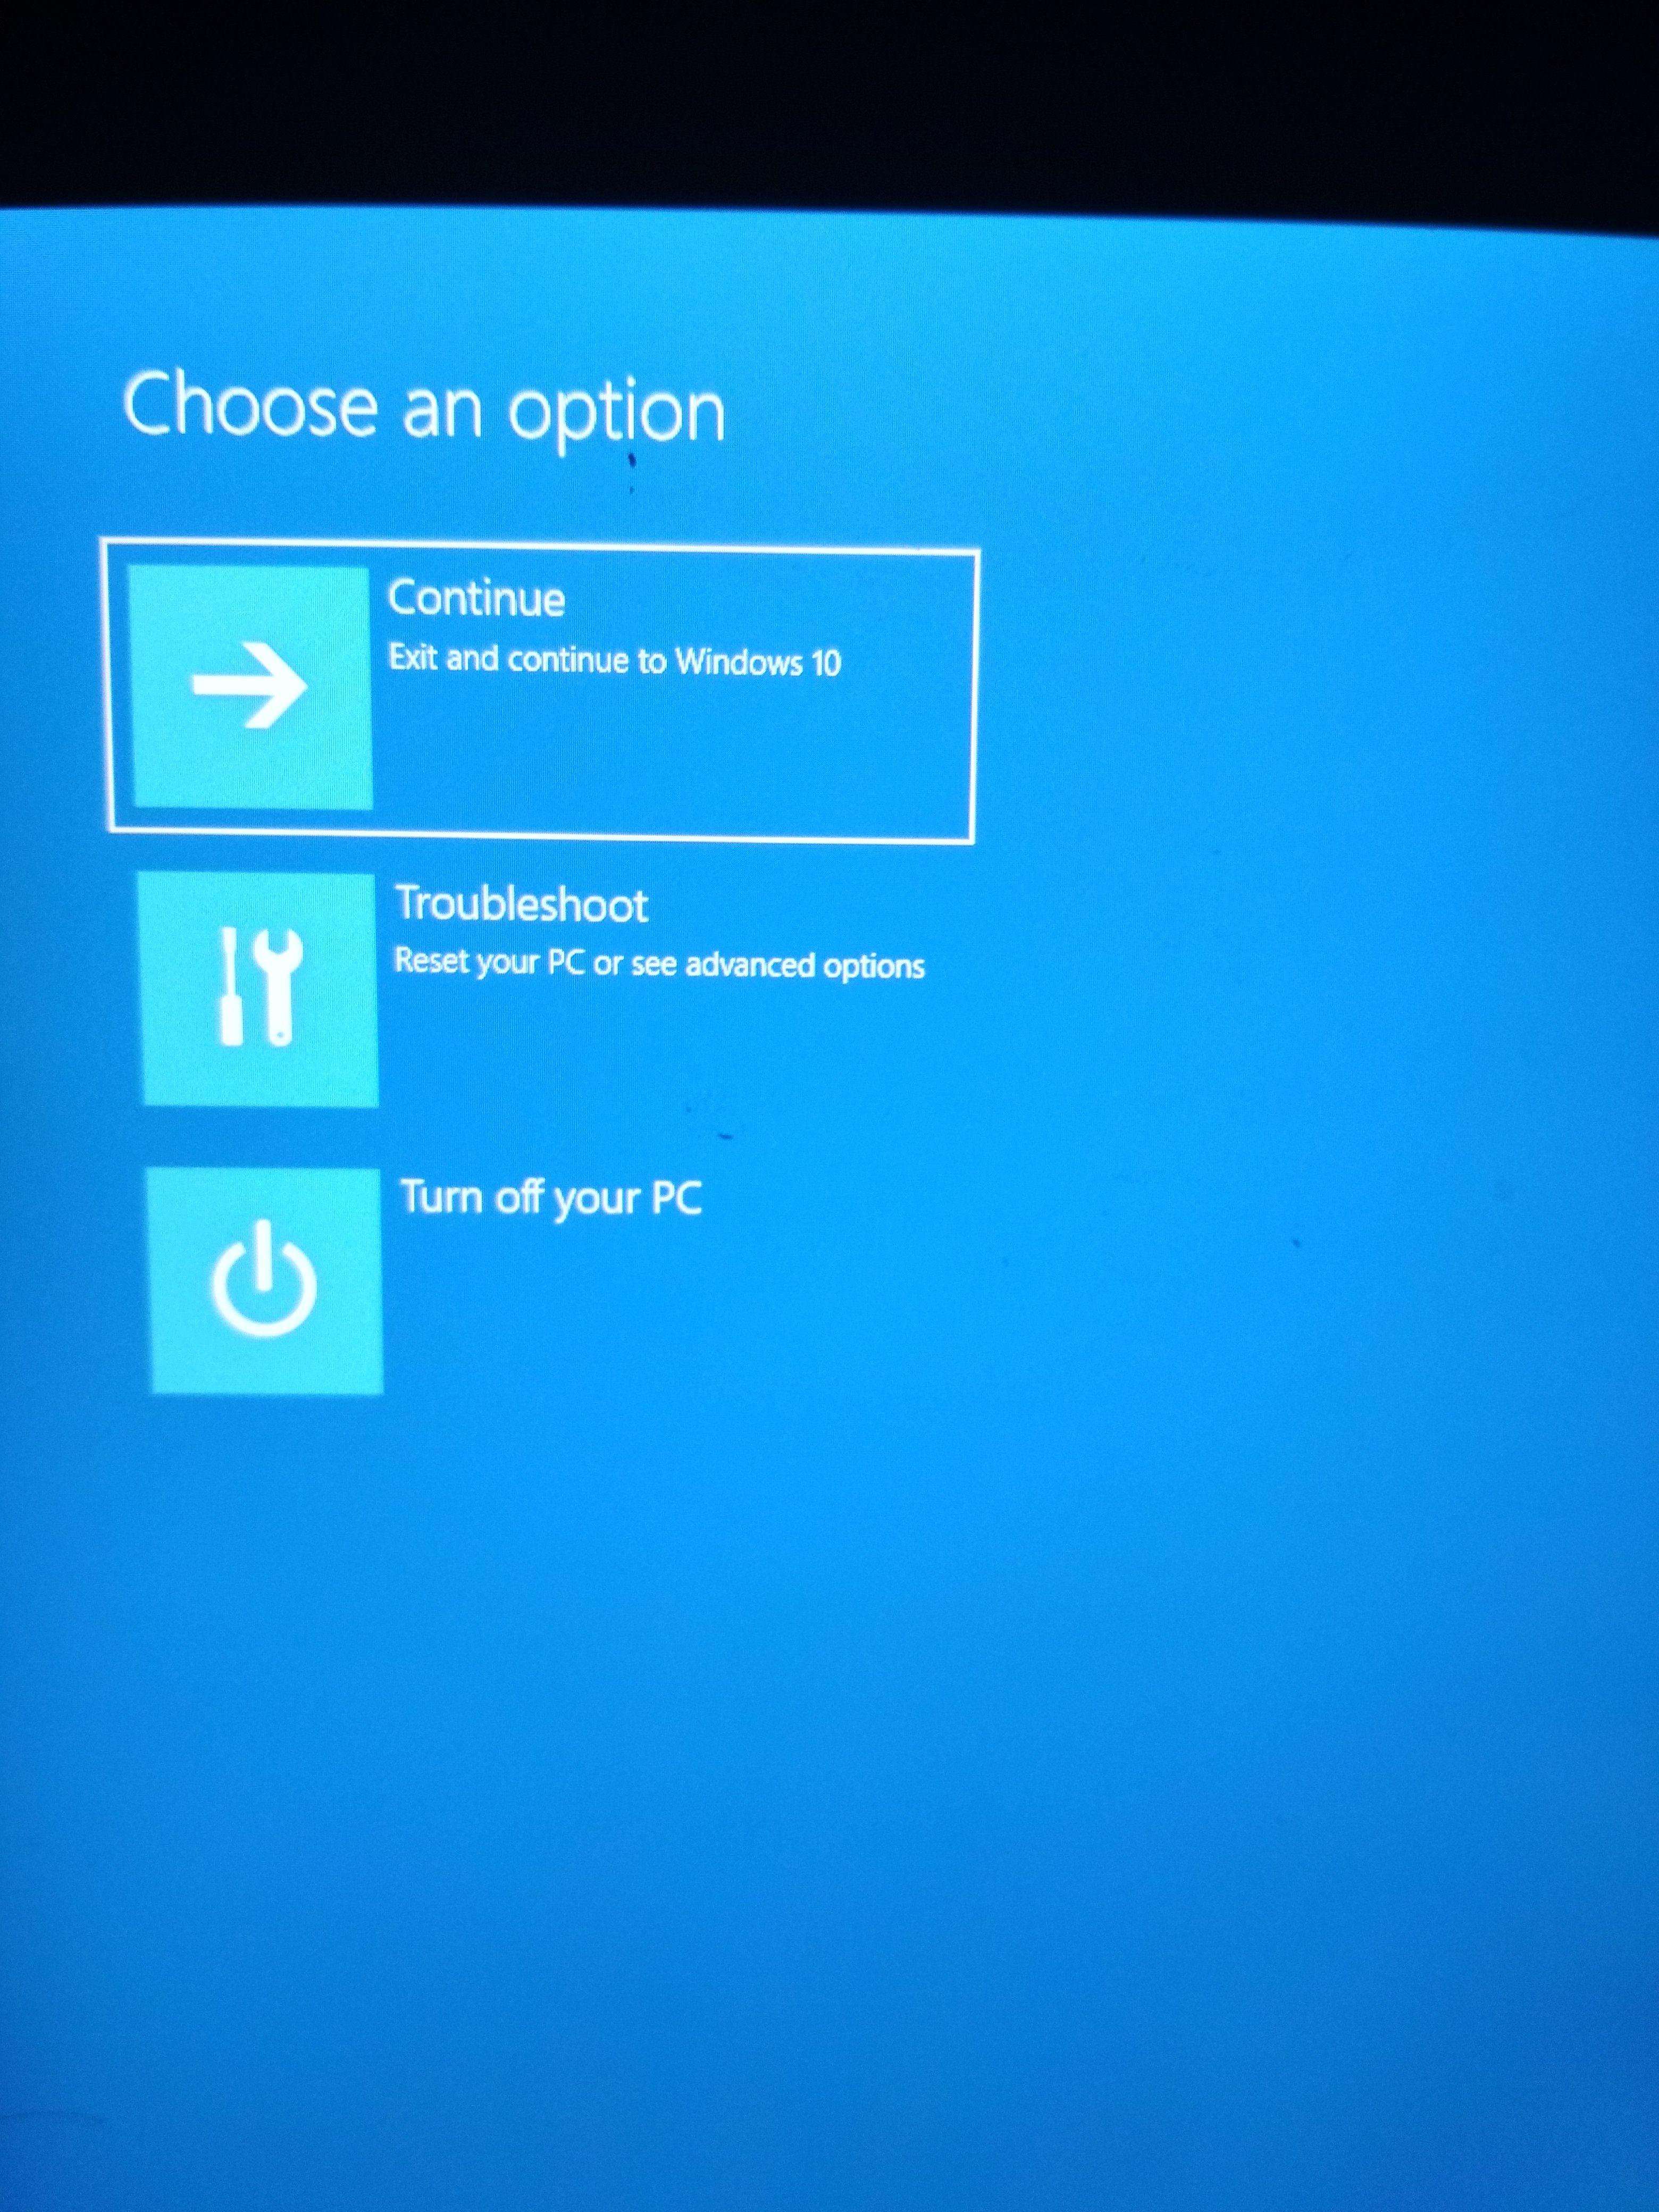 Lenovo Yoga Turn Off Touch Screen : lenovo, touch, screen, Lenovo, Community